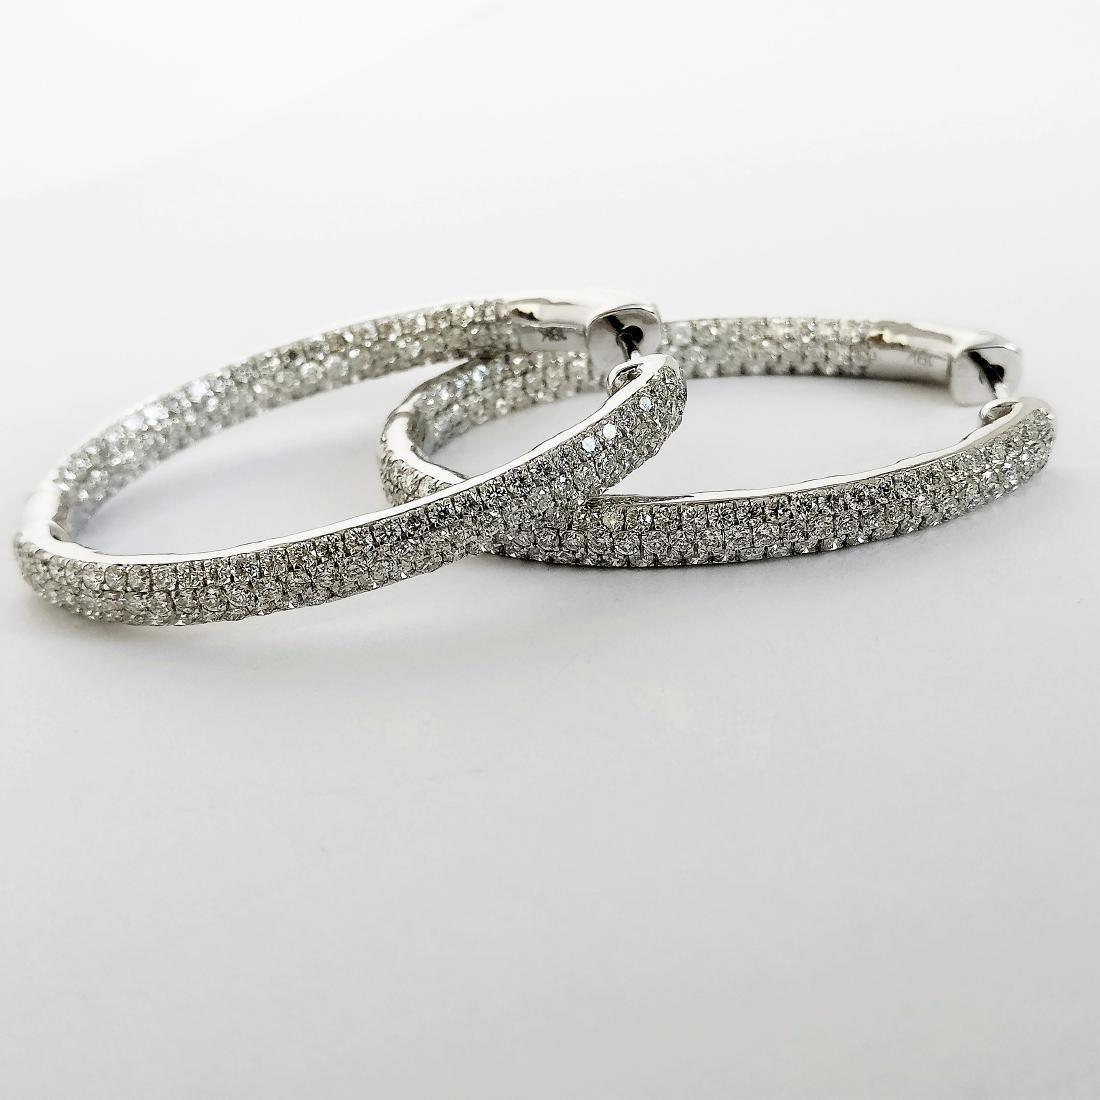 Ladies Earrings with Diamonds total 5.84 ct - 4